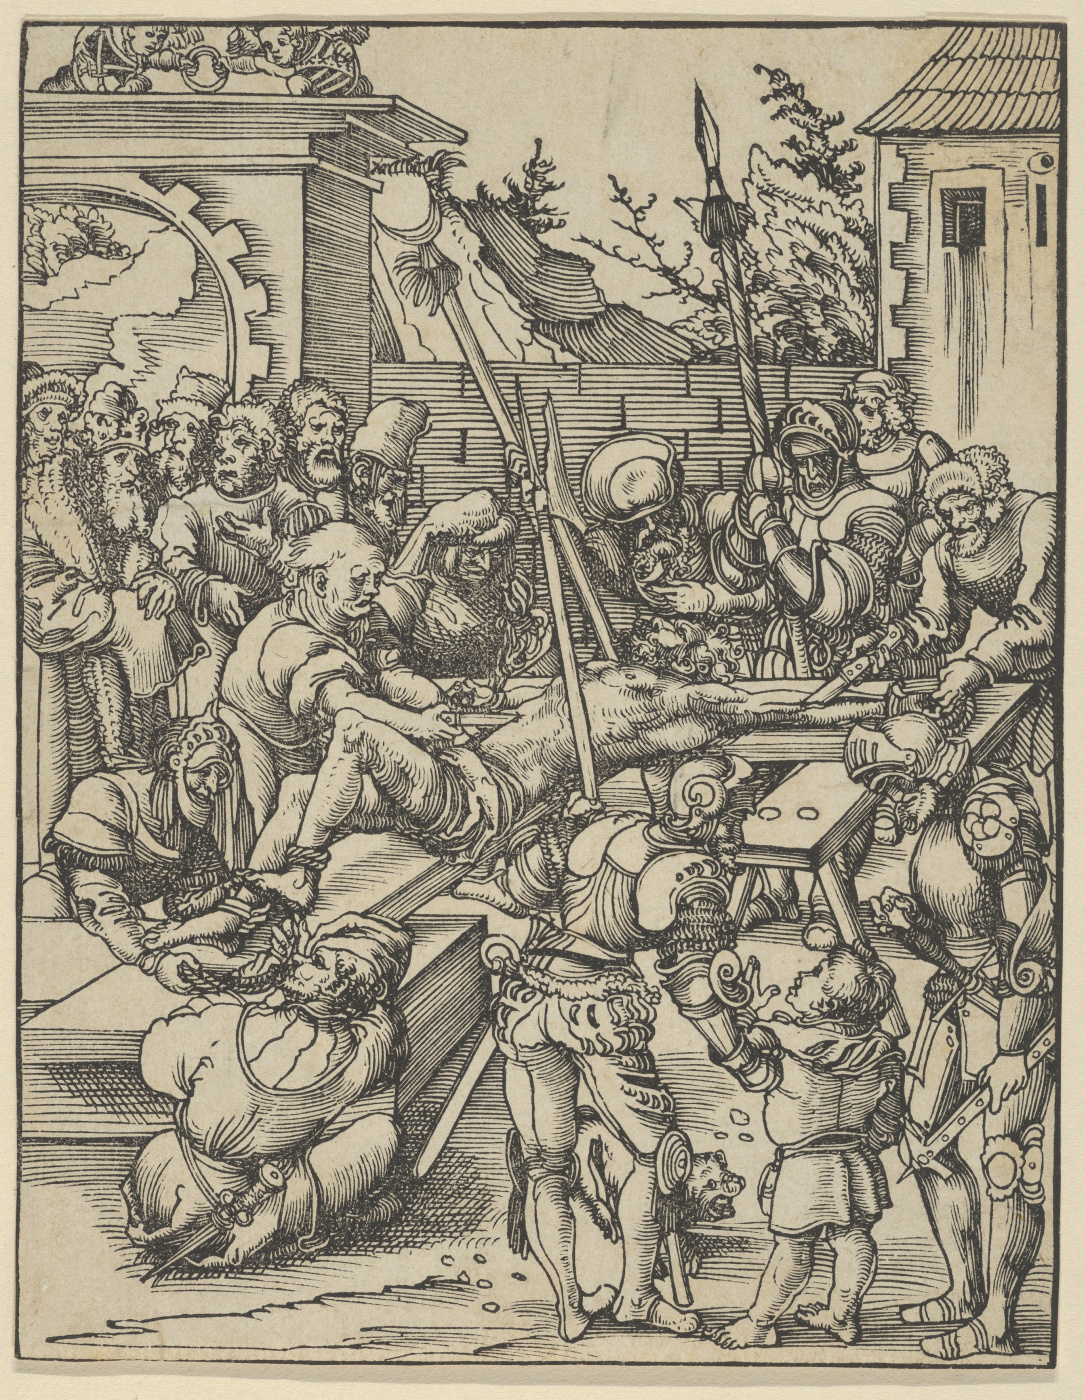 Lucas Cranach the Elder. The martyrdom of St. Philip